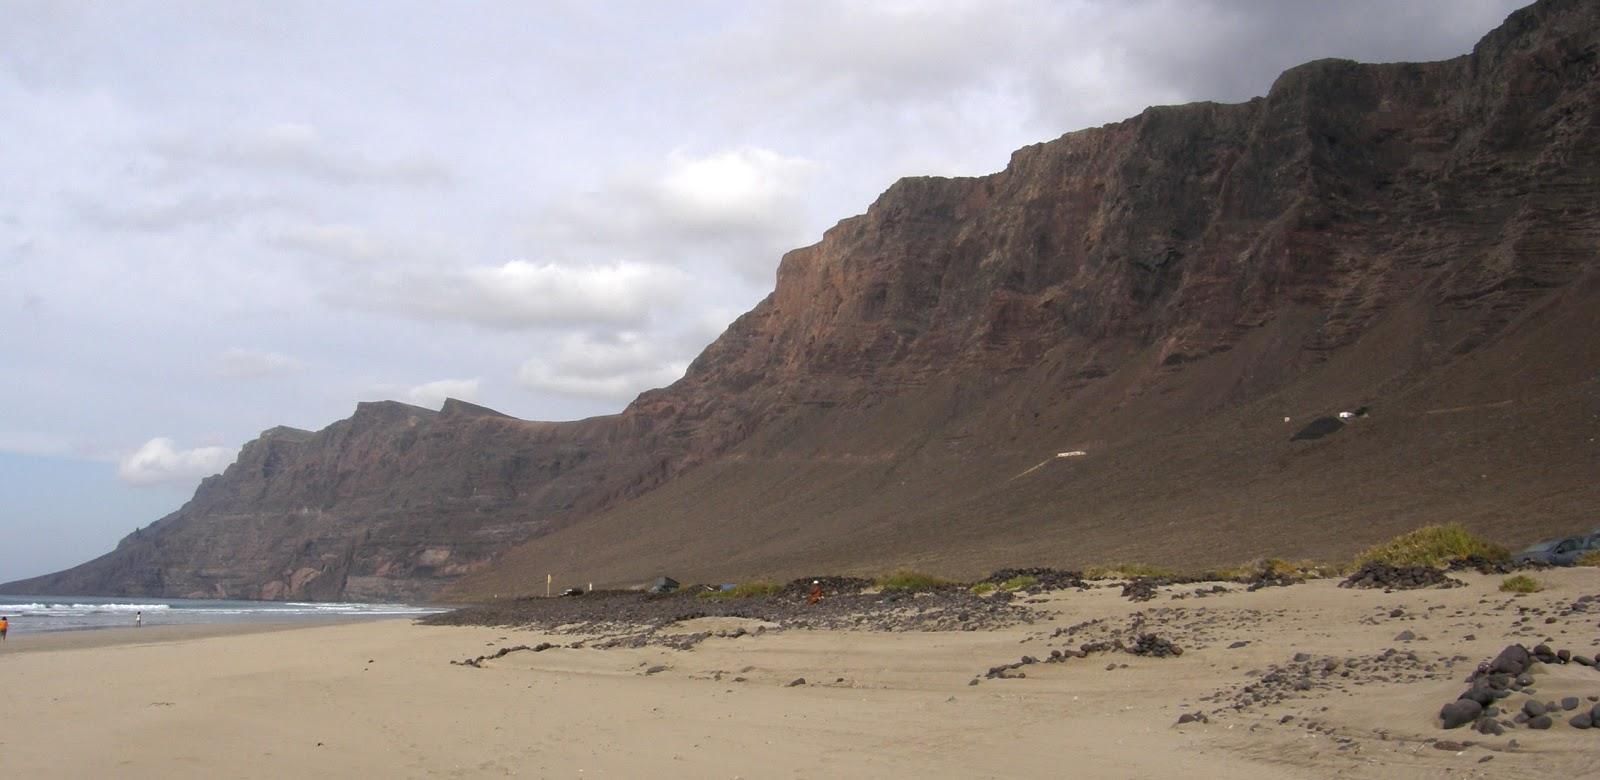 Playa nudista Famara (Lanzarote)